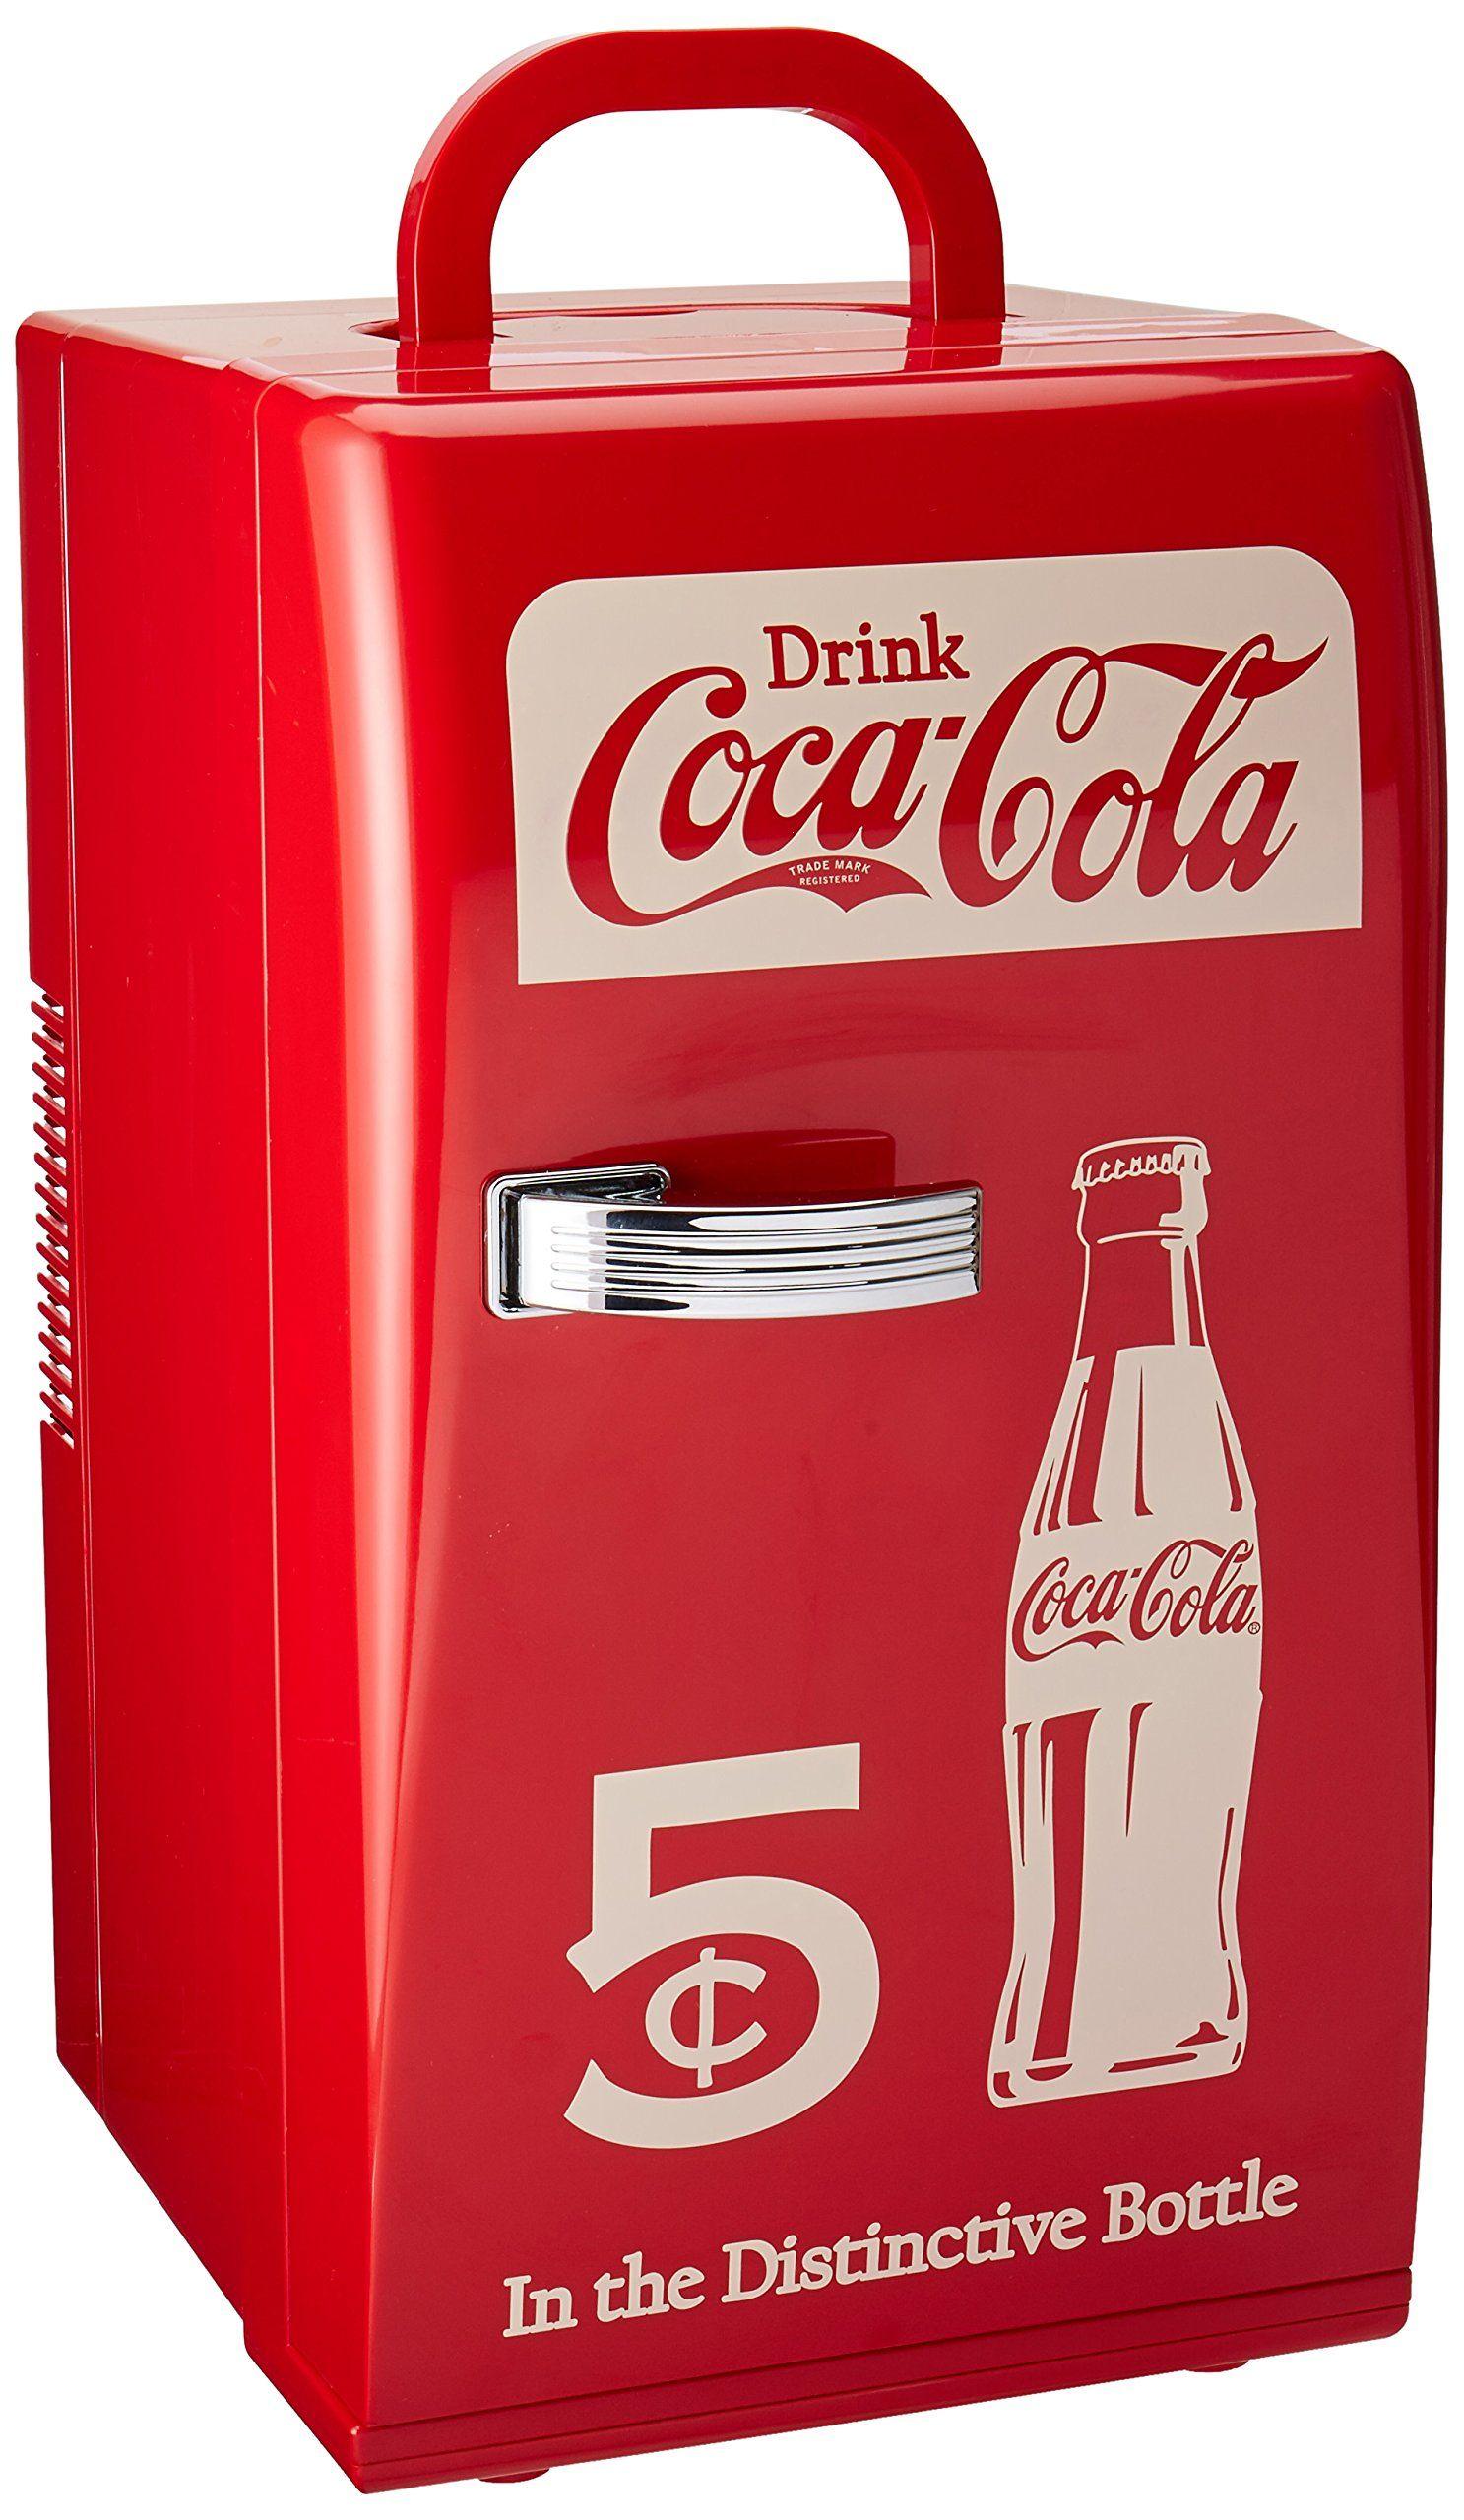 Buy Coca Cola CCR-12 Retro Fridge, Red - Topvintagestyle.com ✓ FREE ...